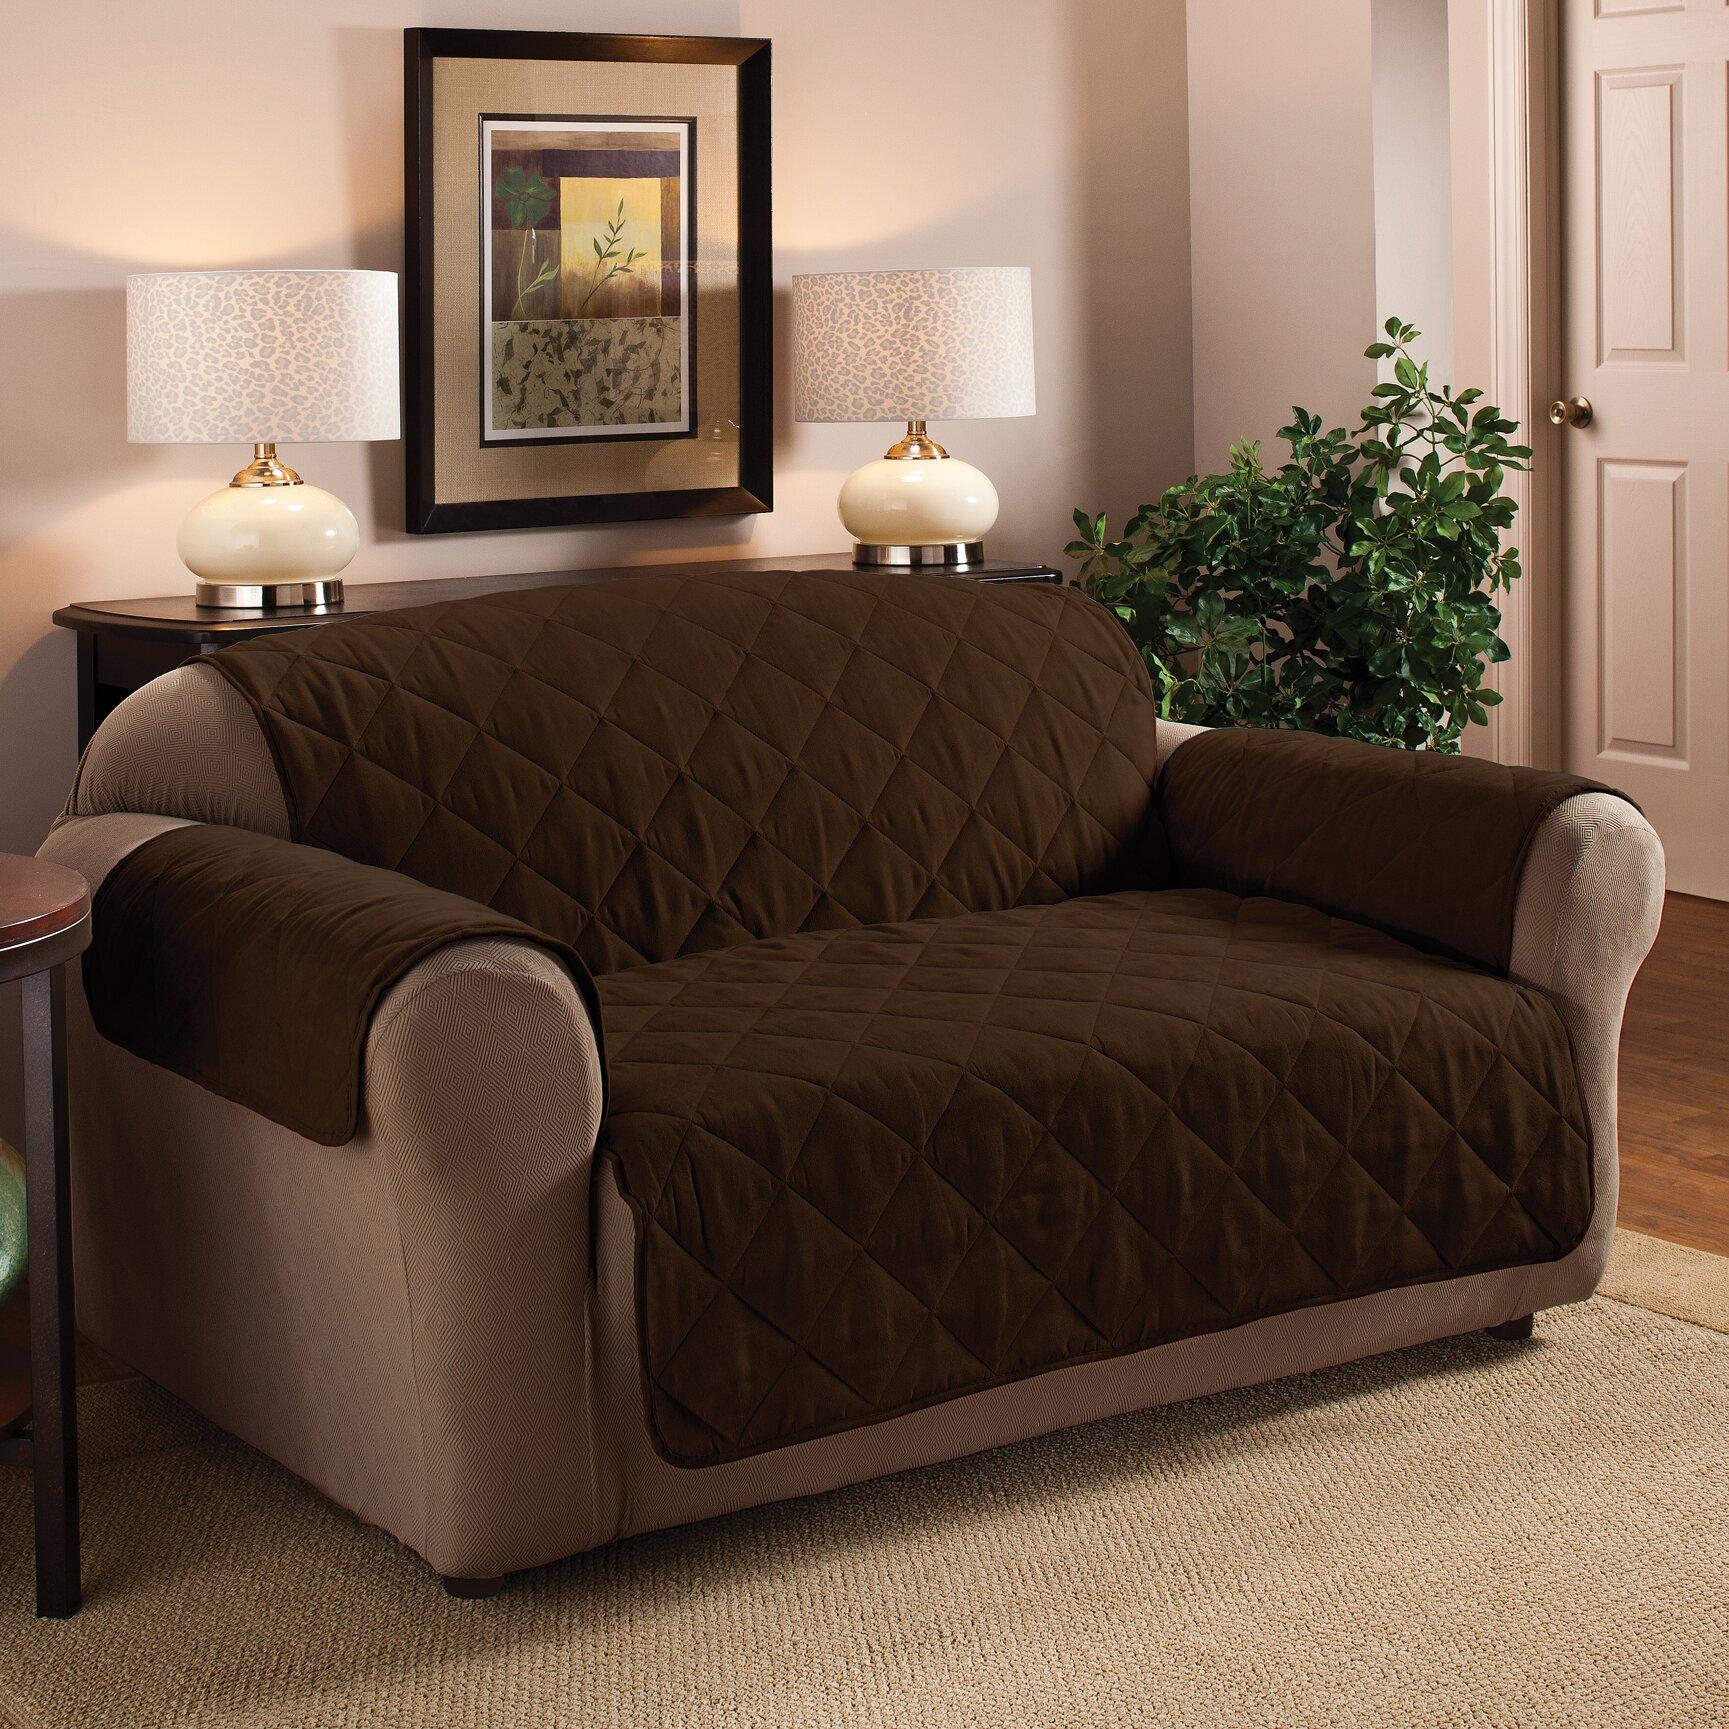 Innovative textile solutions faux suede furniture sofa - Foros para sofas ...